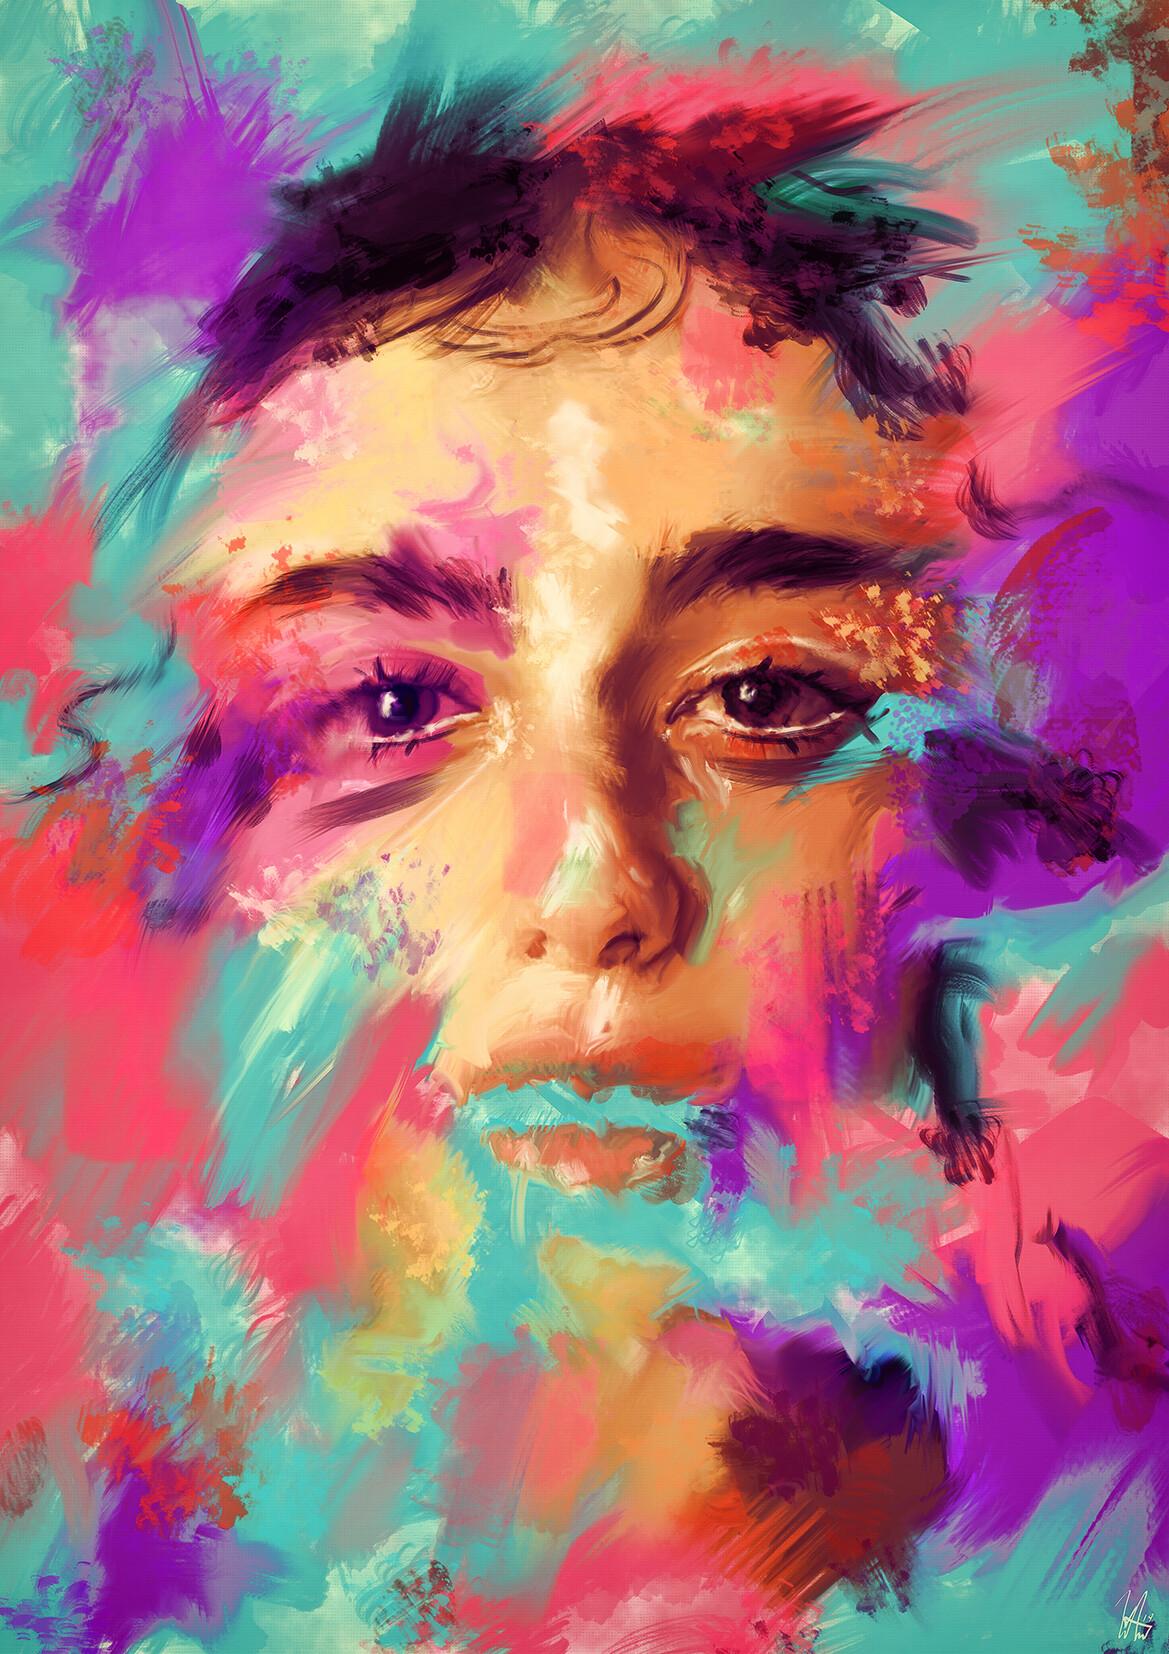 Liam golden drown 02 edits